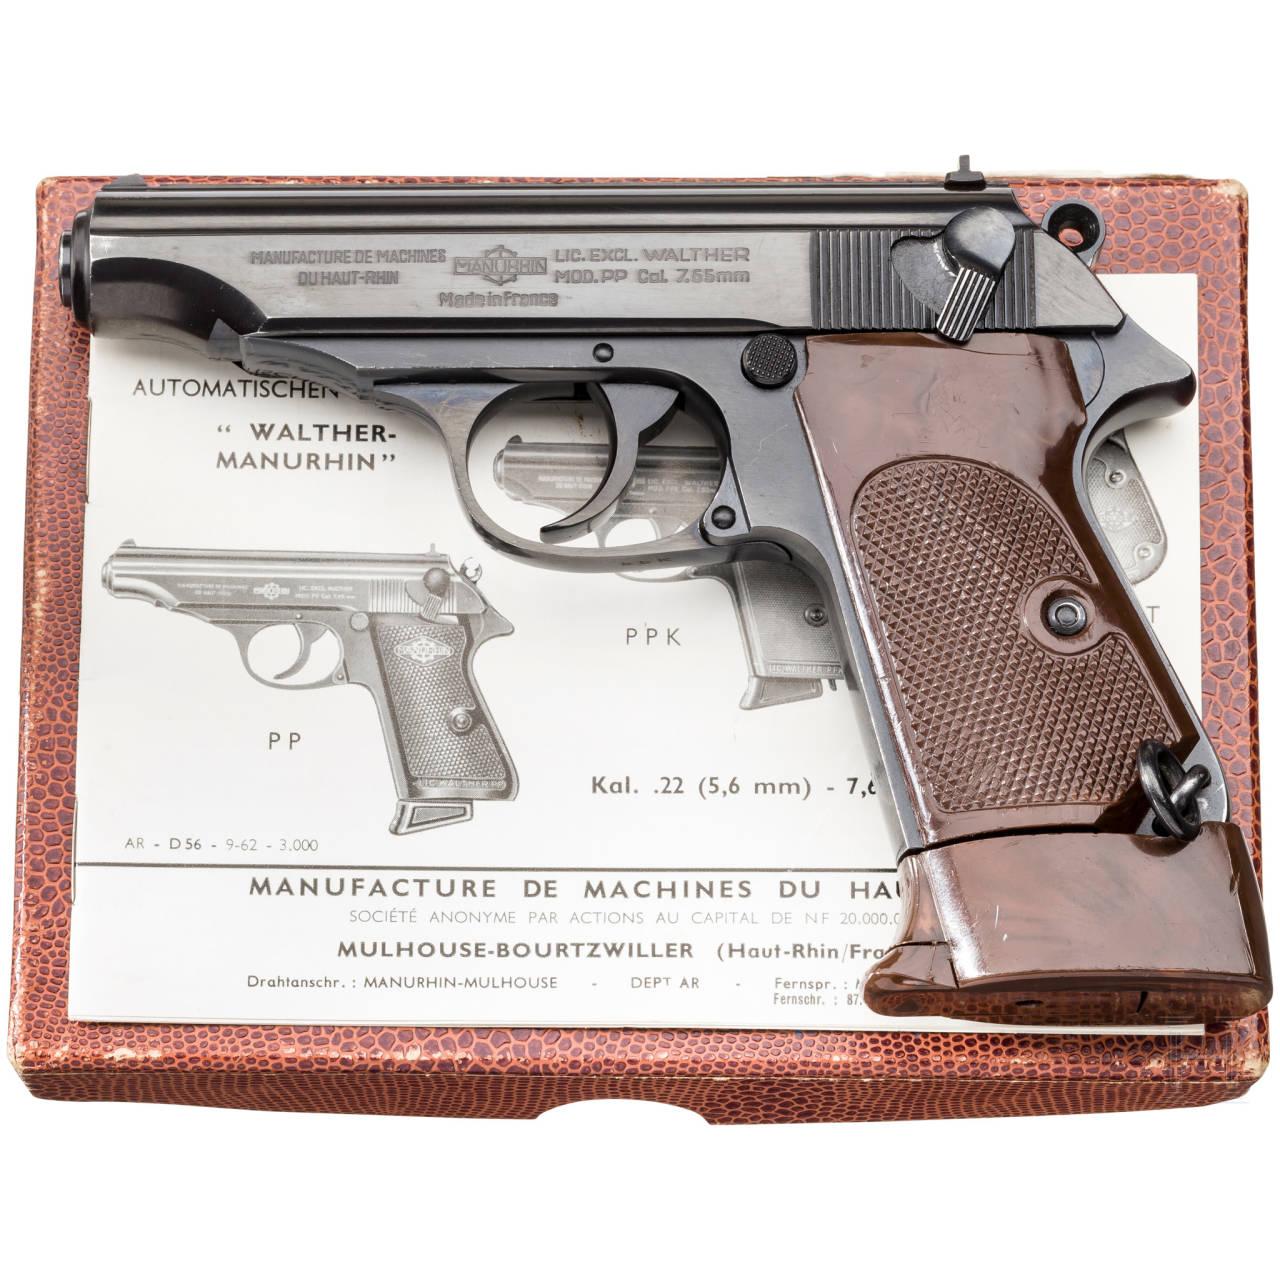 Walther-Manurhin PP, Ordonnanz, im Karton